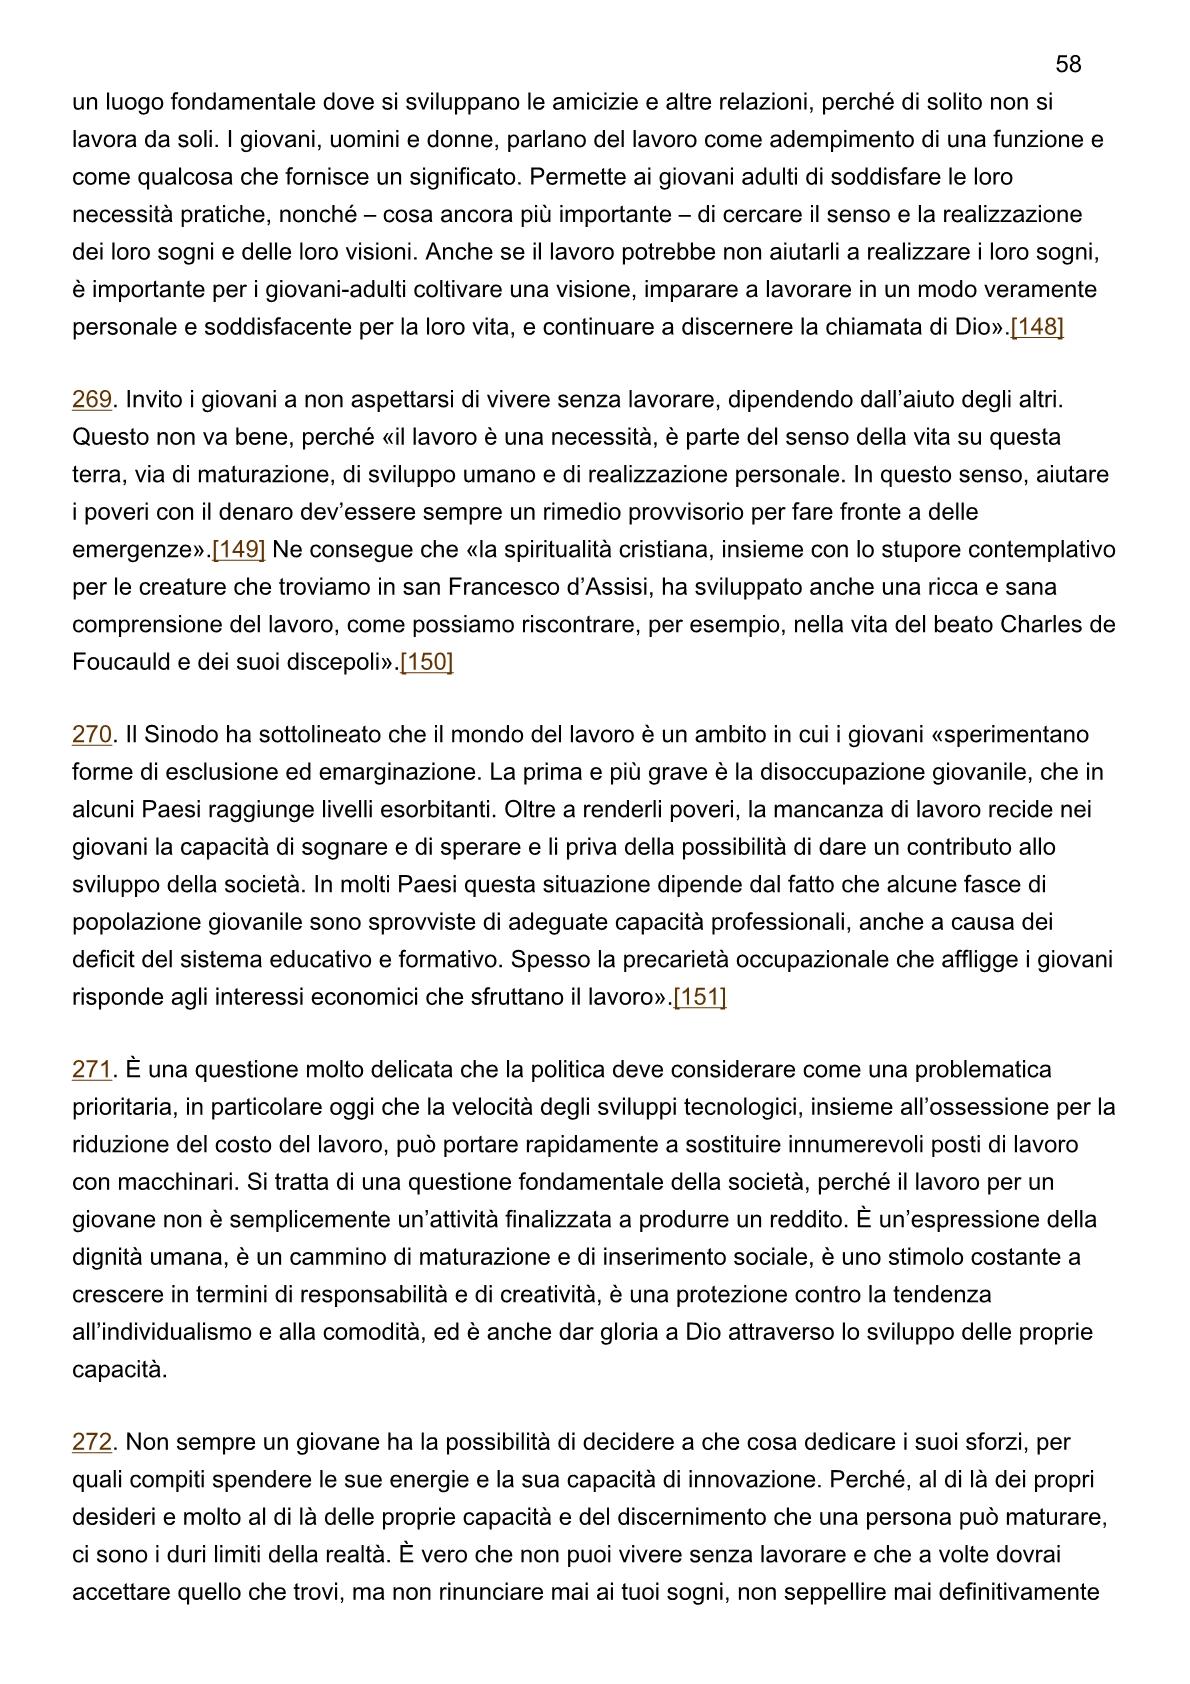 papa-francesco_esortazione-ap_20190325_christus-vivit58